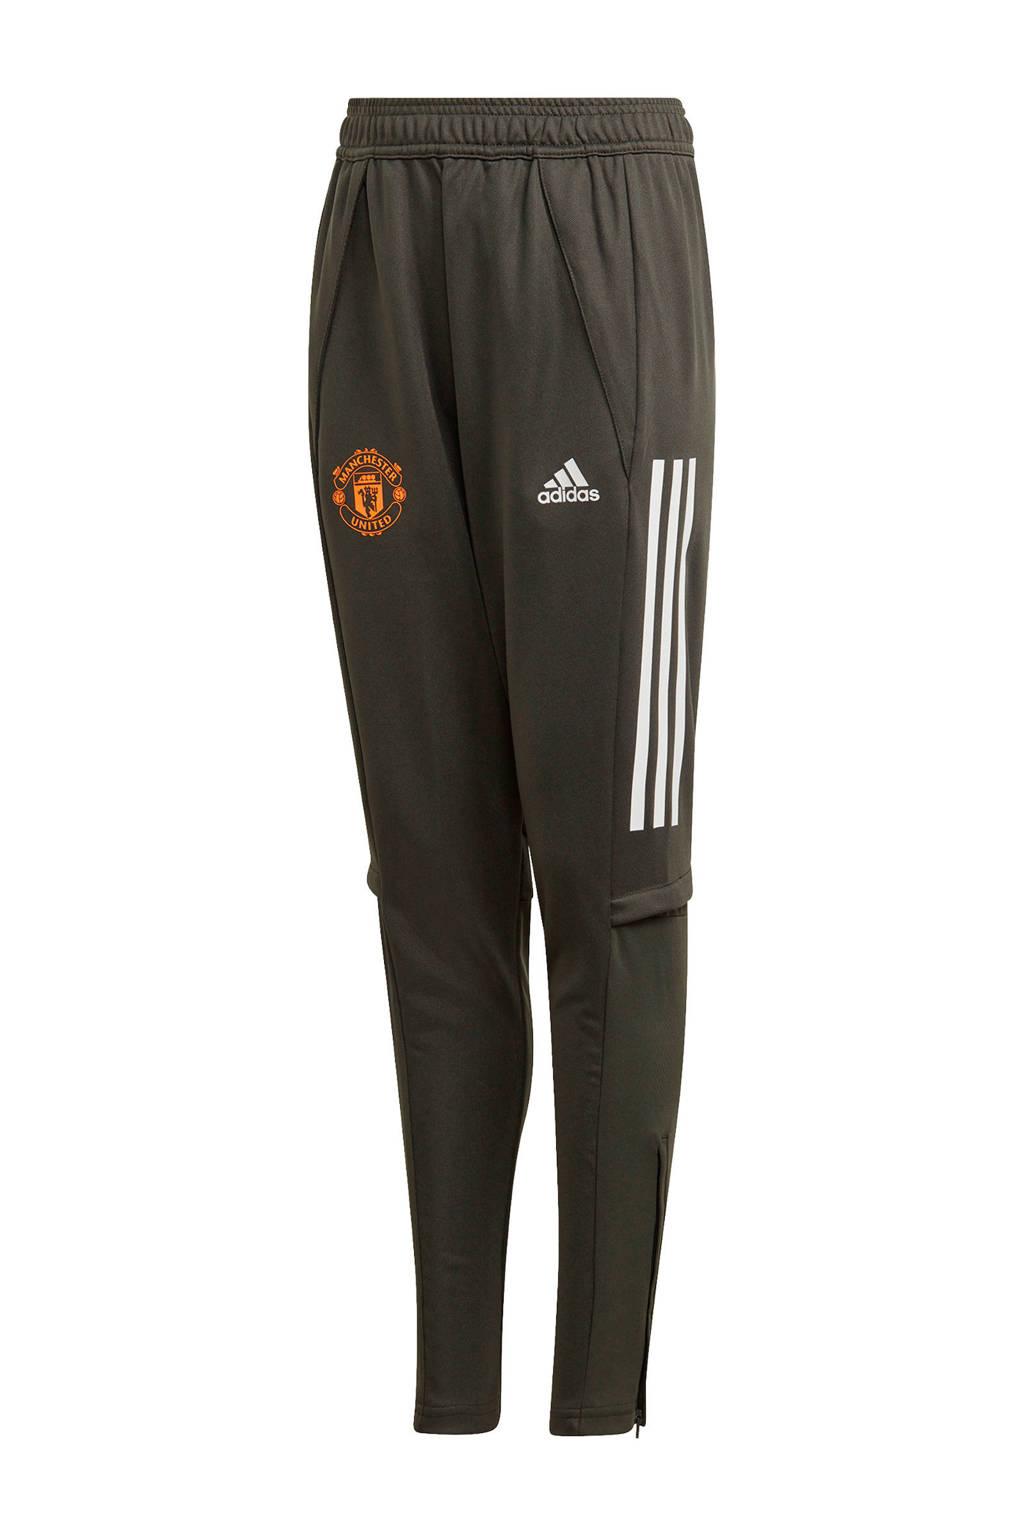 adidas Performance Junior Manchester United voetbalbroek Training, Donkergroen